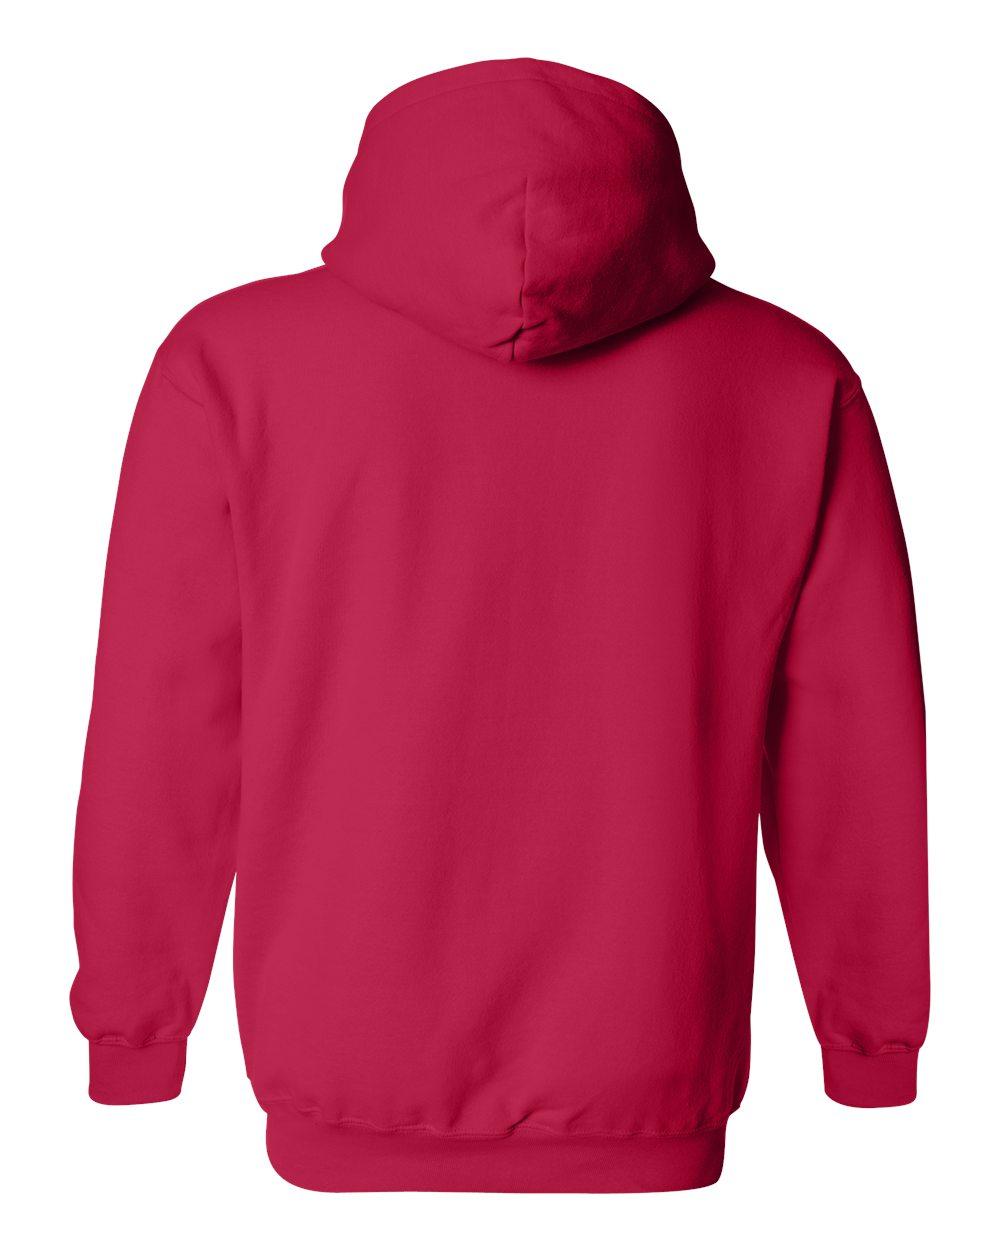 Gildan-Mens-Blank-Hoodie-Heavy-Blend-Hooded-Sweatshirt-Solid-18500-up-to-5XL thumbnail 22